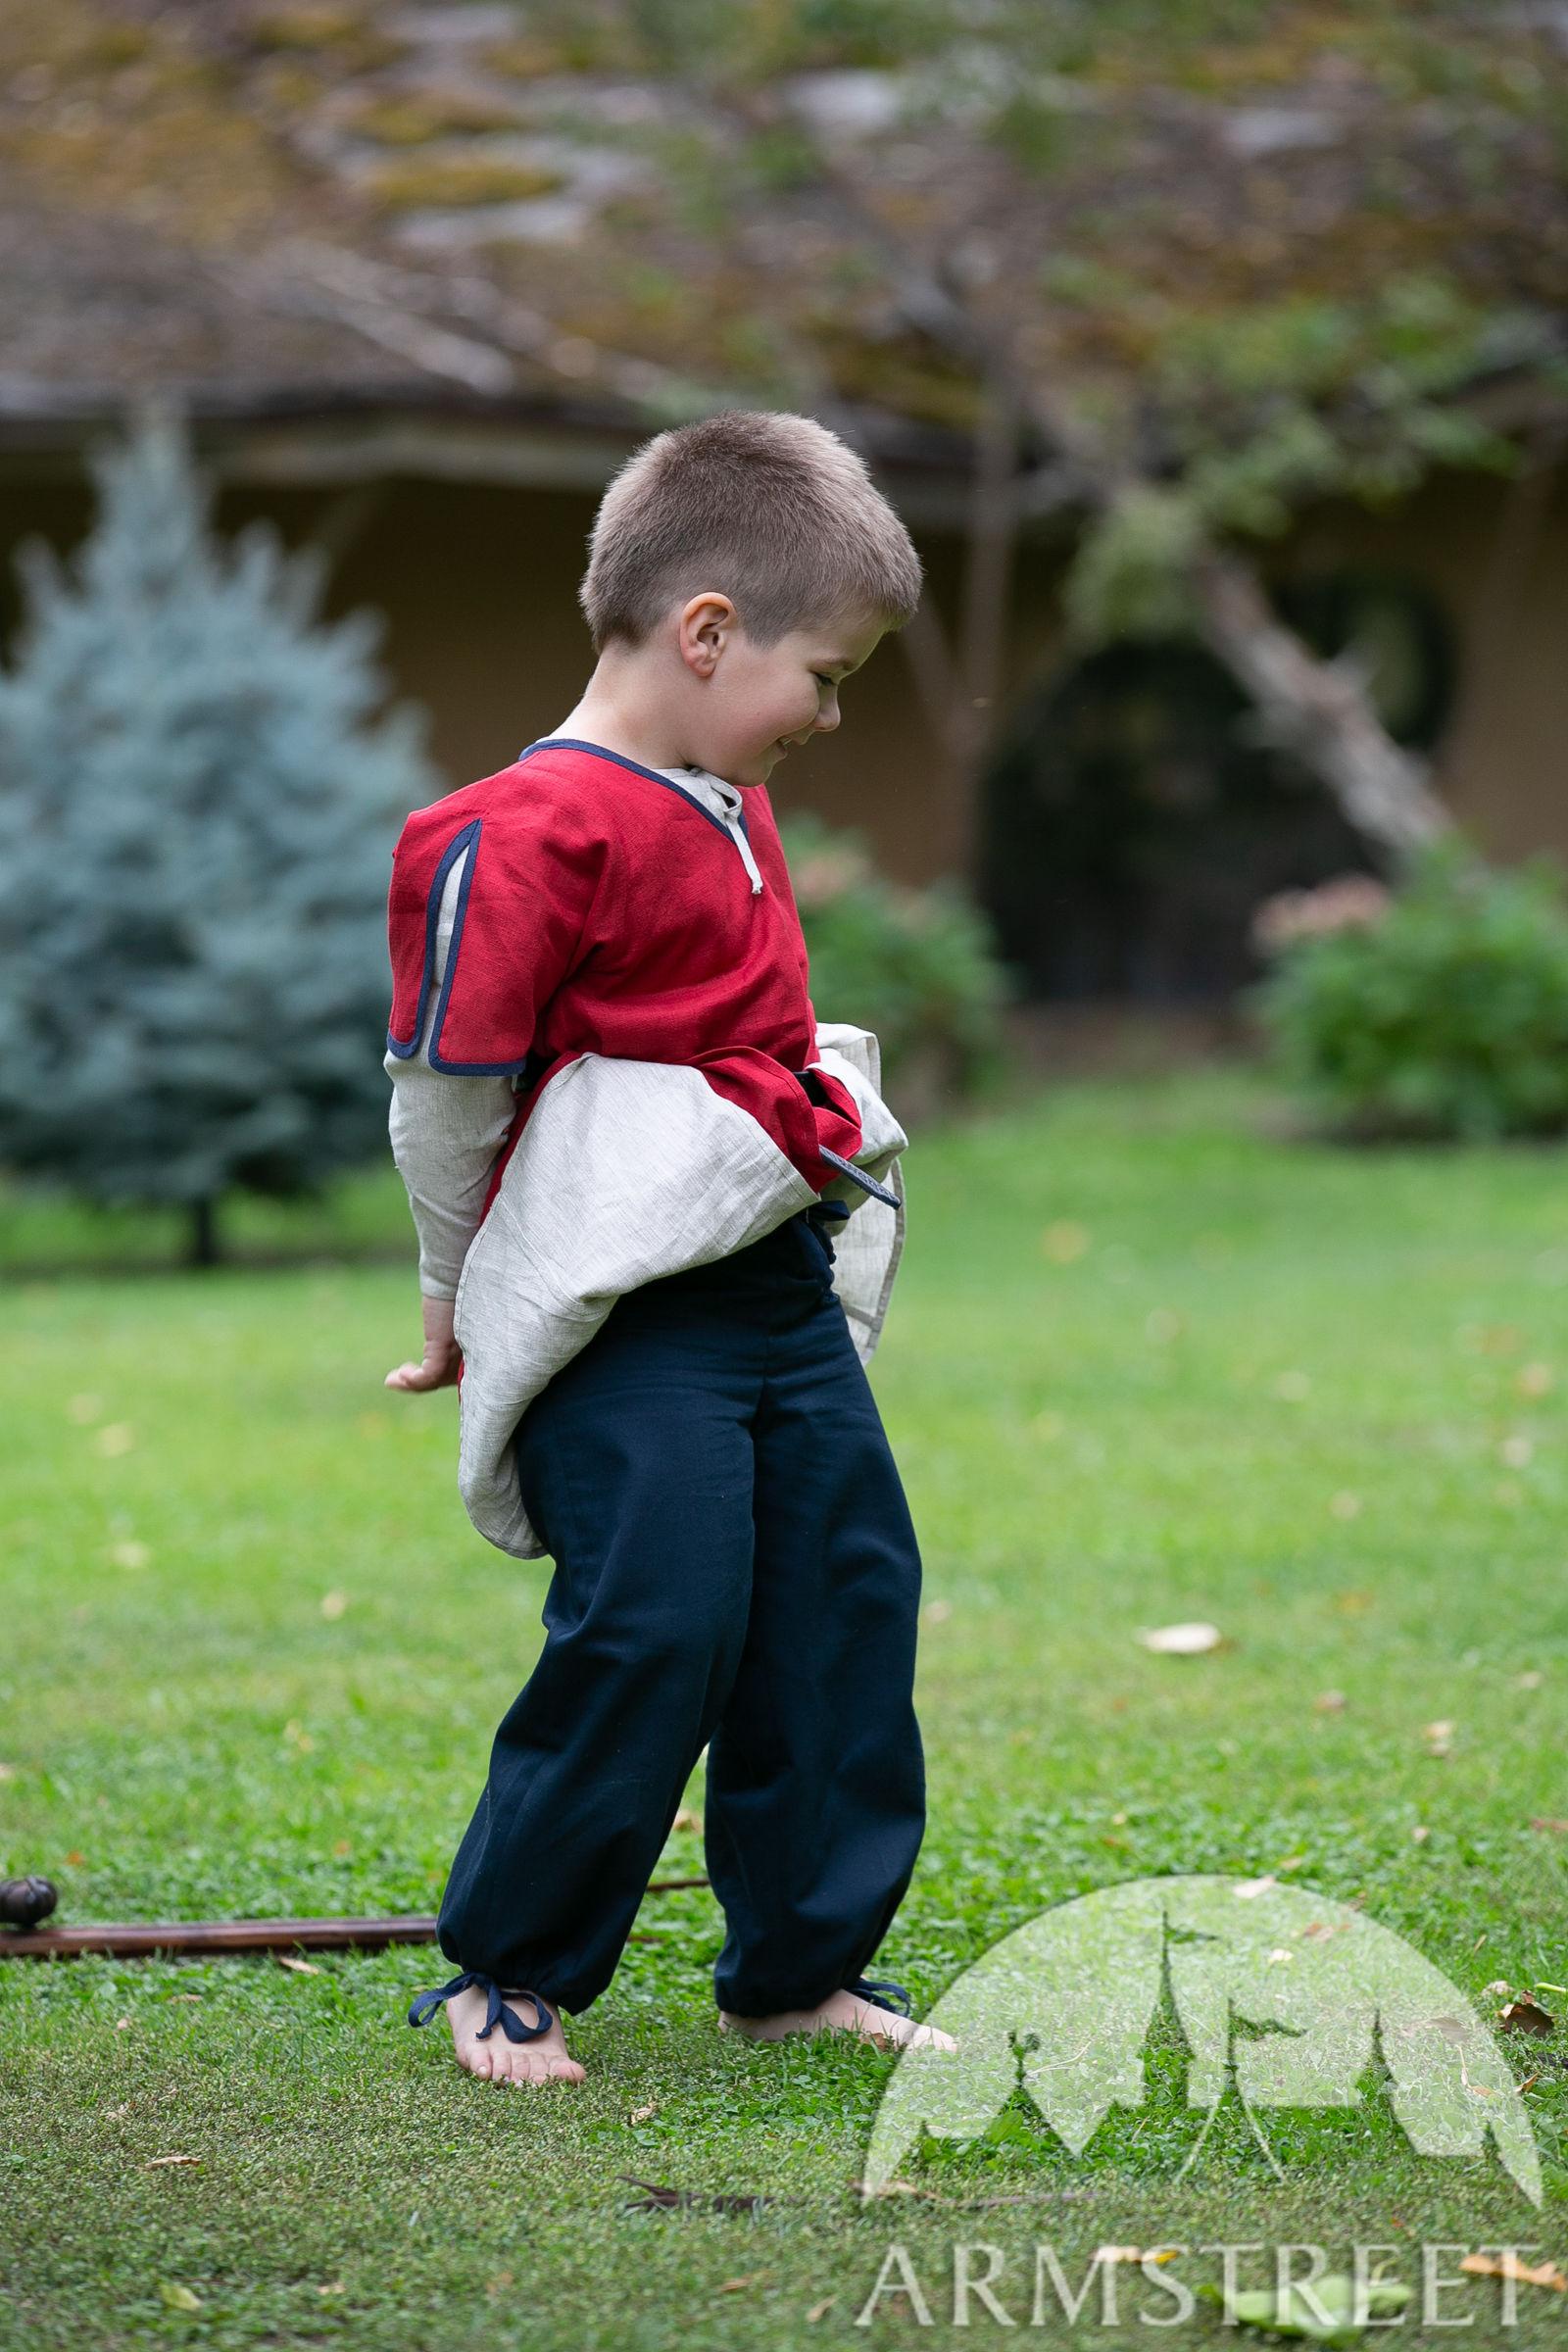 https://armstreet.com/catalogue/full/kids-cotton-medieval-pants-first-adventure-for-children-2.jpg